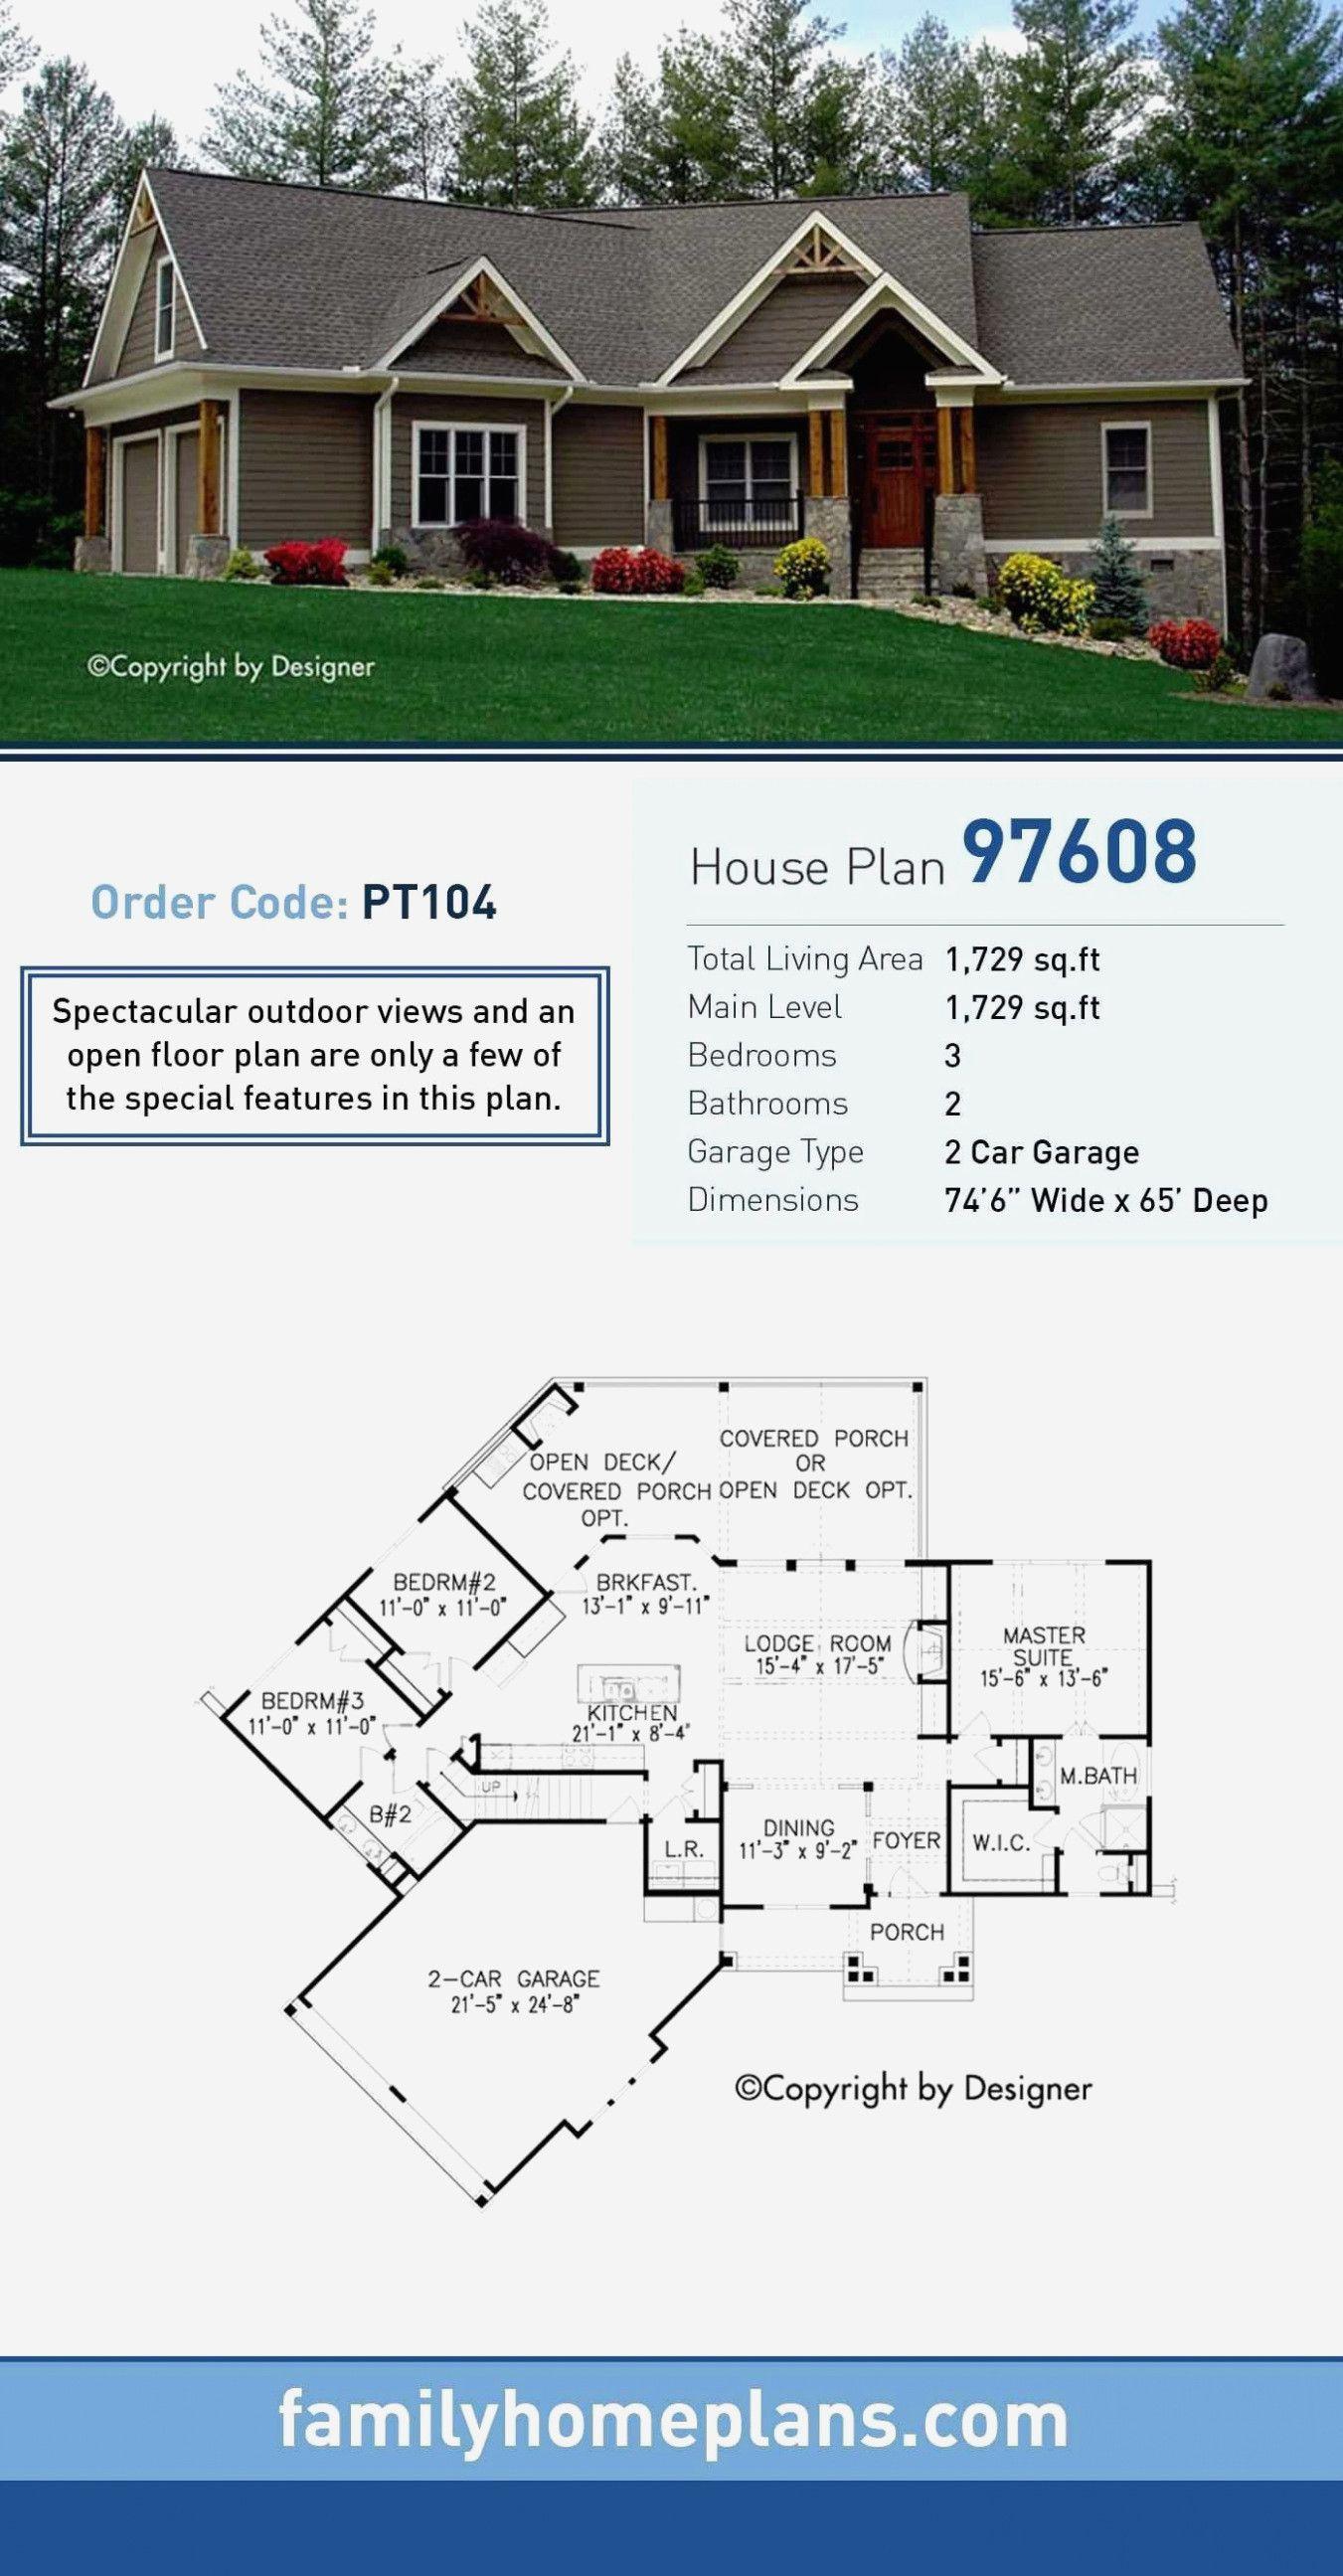 12 Genius Ways How To Craft Backyard Grill Ideas Porch House Plans Minecraft Modern House Blueprints House Blueprints